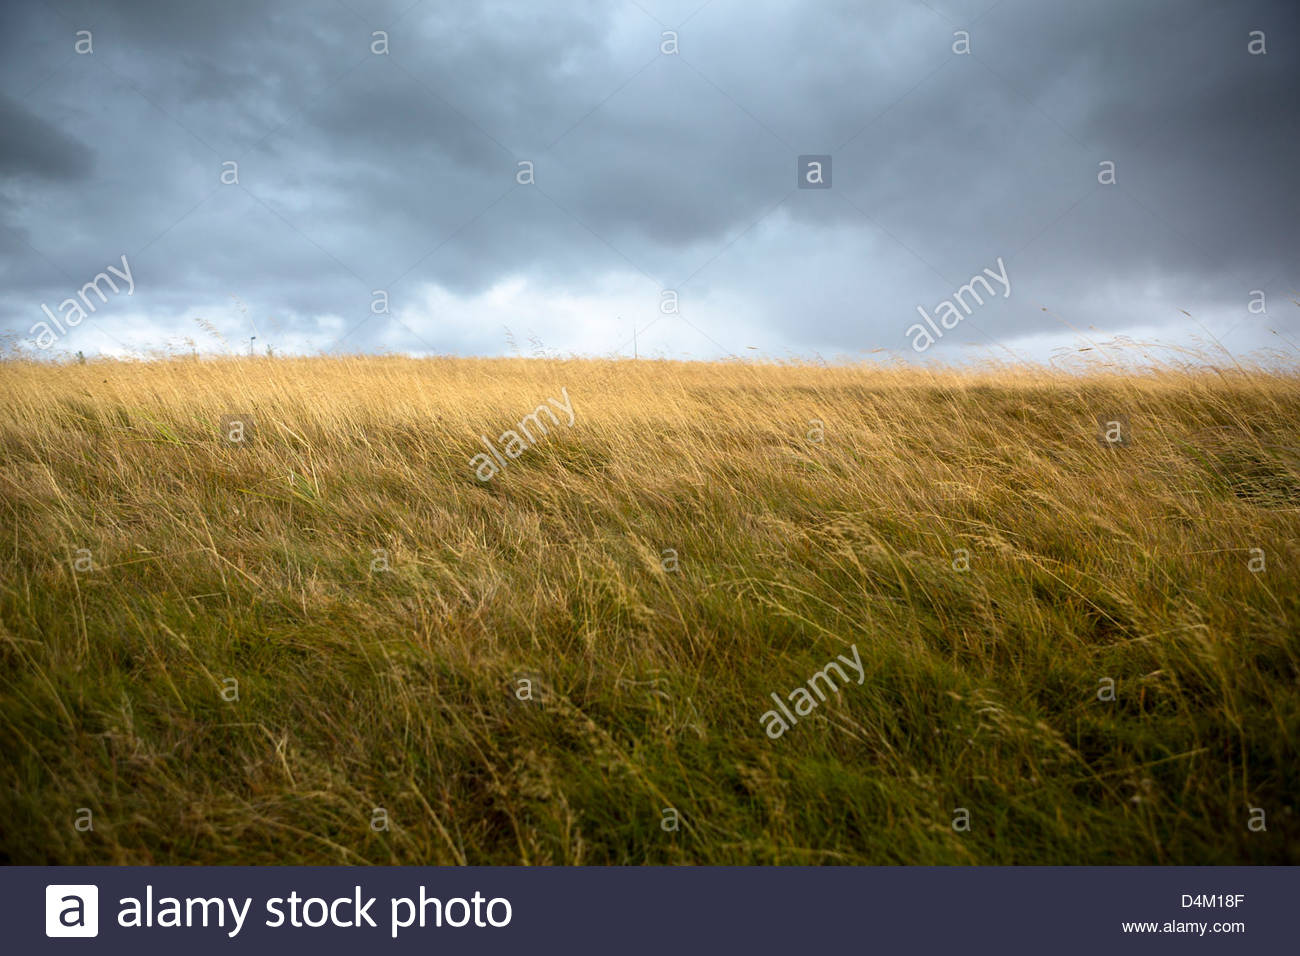 tall grass field yellow field of tall grass blowing in wind stock photo 54529791 alamy